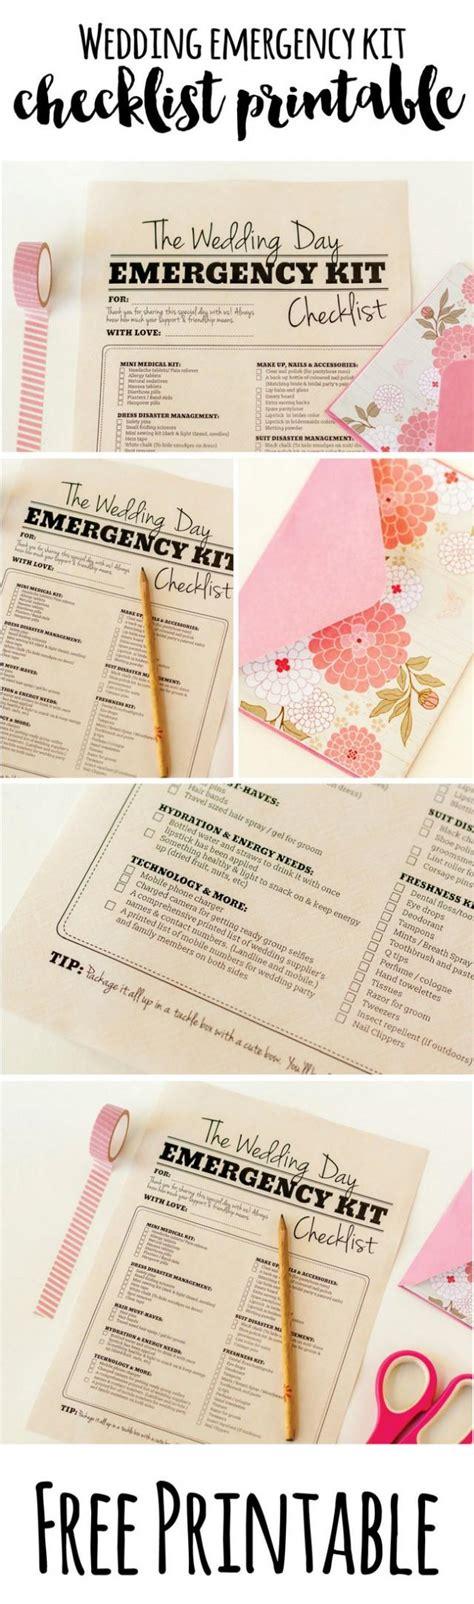 Wedding Emergency Checklist Kit by Wedding Day Emergency Kit Checklist Free Printable